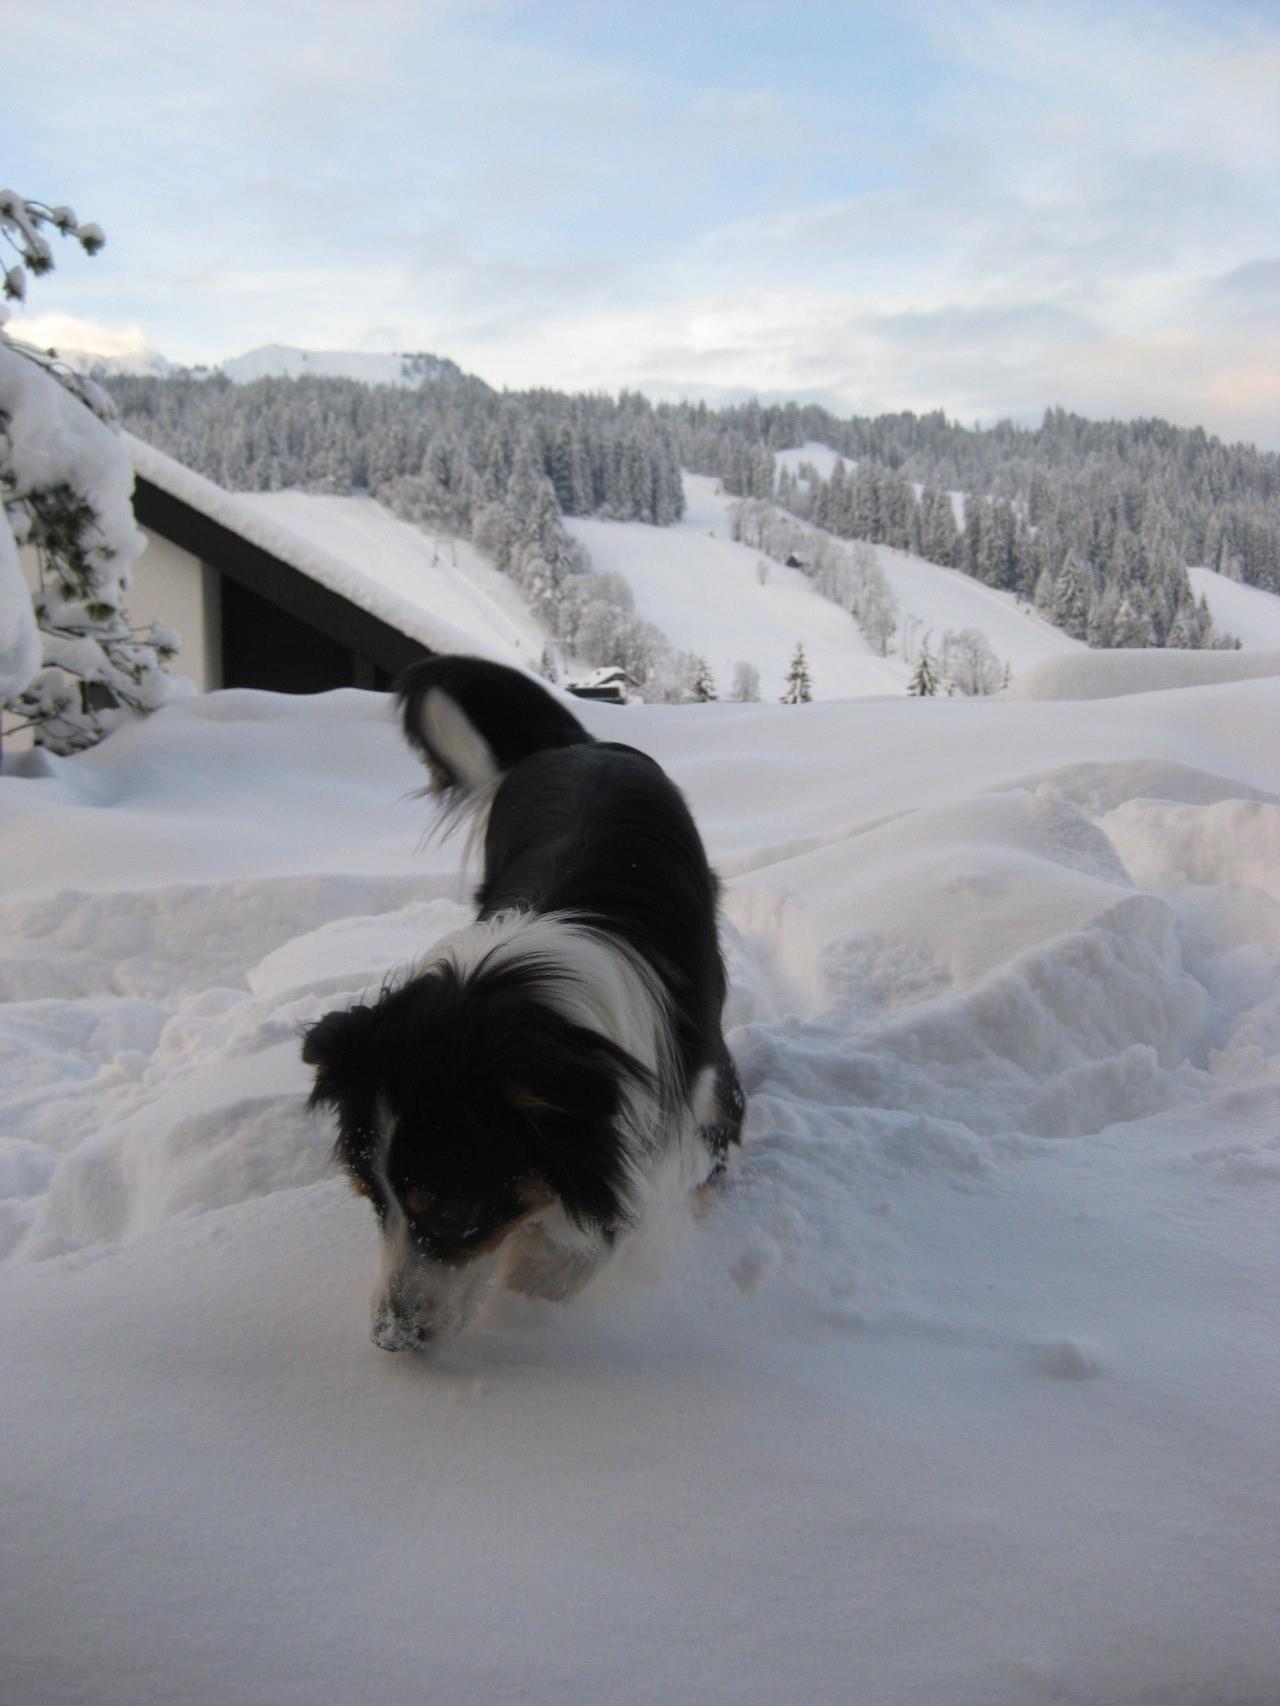 Tauchgang im Schnee.... tolll!!